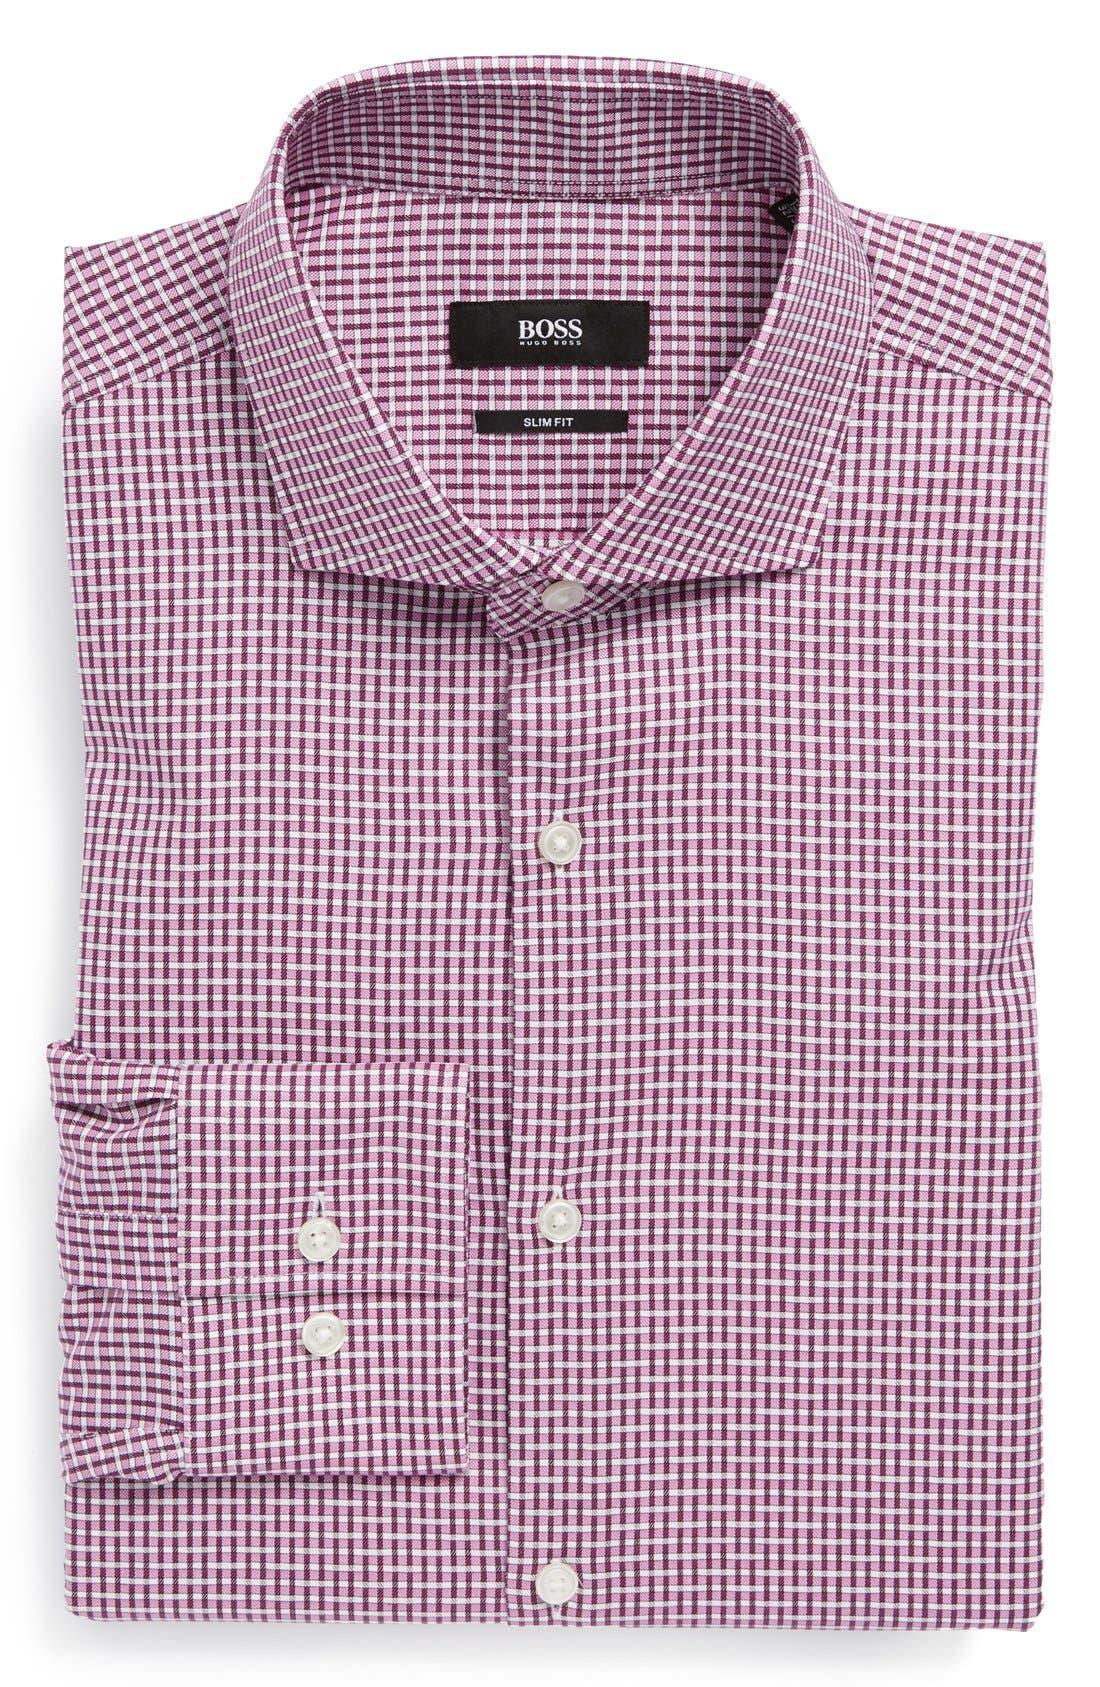 Alternate Image 1 Selected - BOSS HUGO BOSS 'Sanders' Extra Trim Fit Dress Shirt